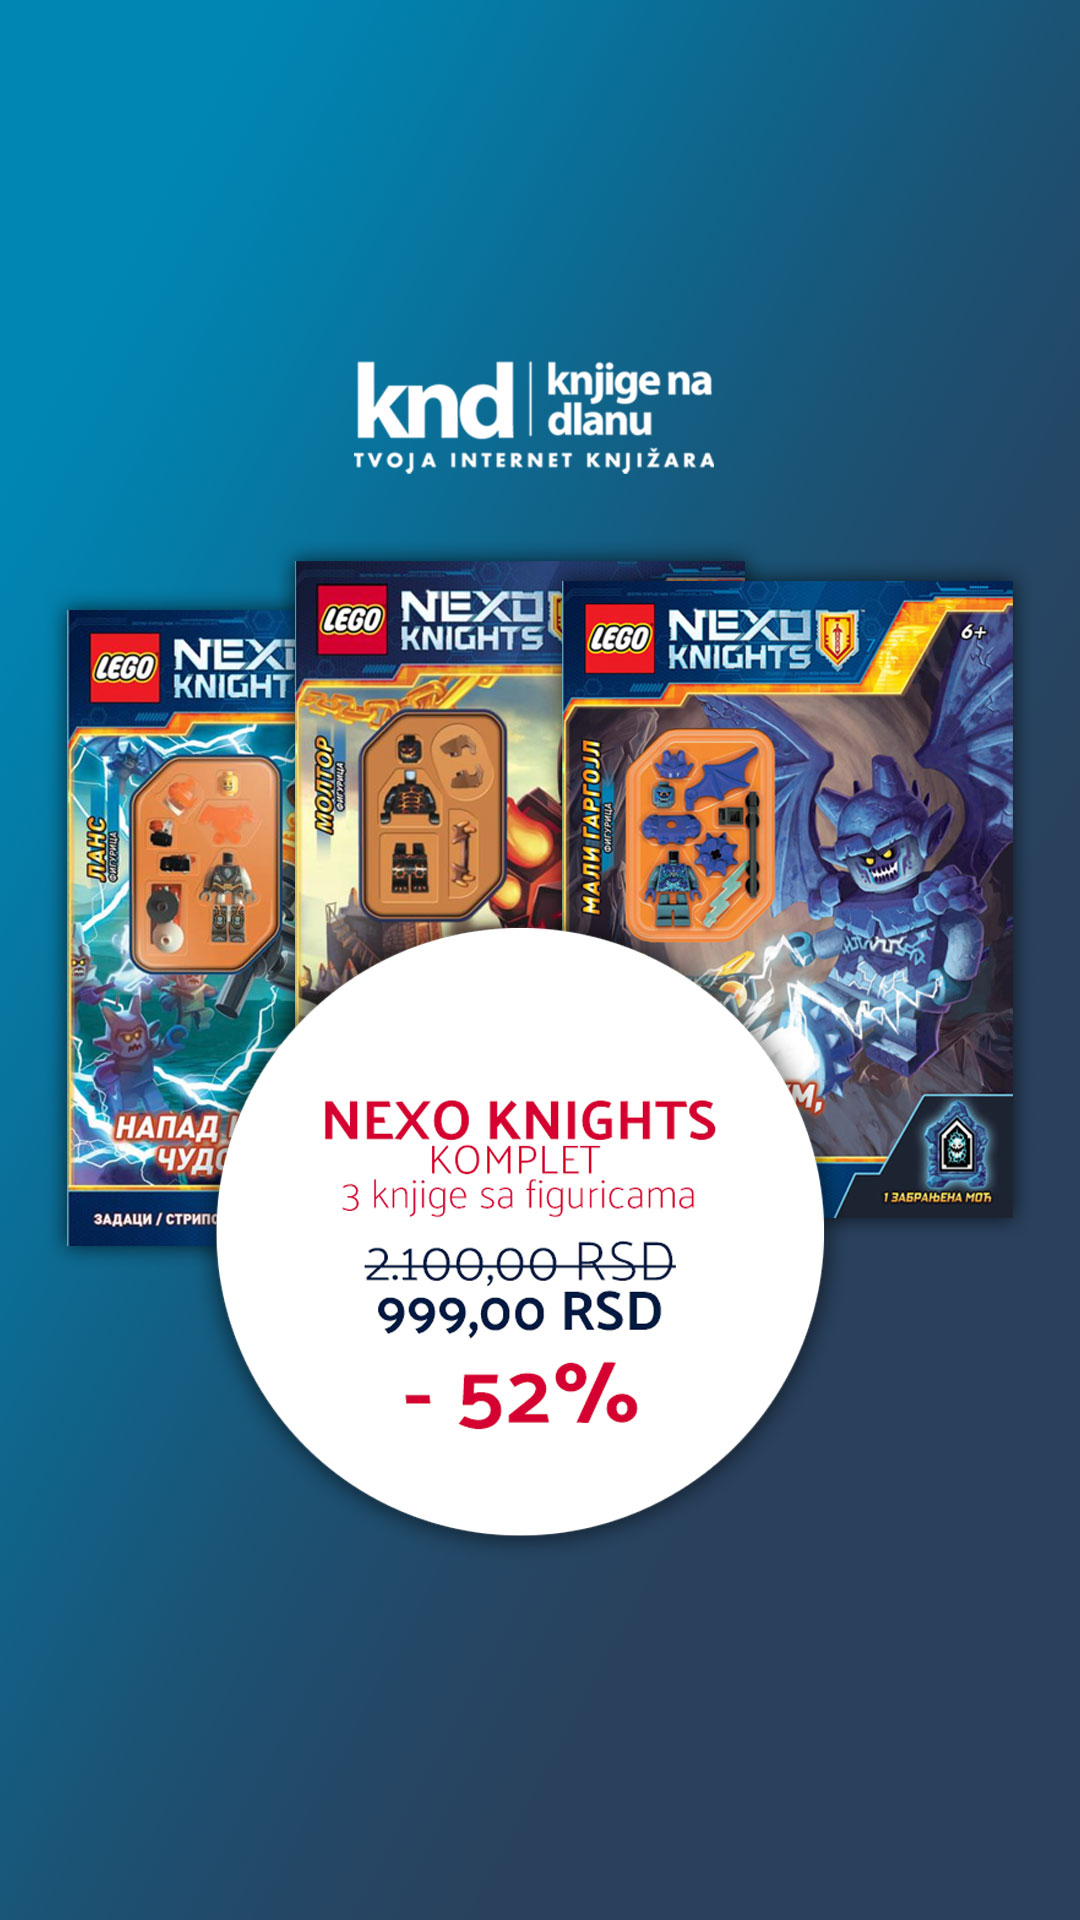 LEGO NEXO KNIGHTS KOMPLET – 3 KNJIGE SA FIGURICAMA ZA 999